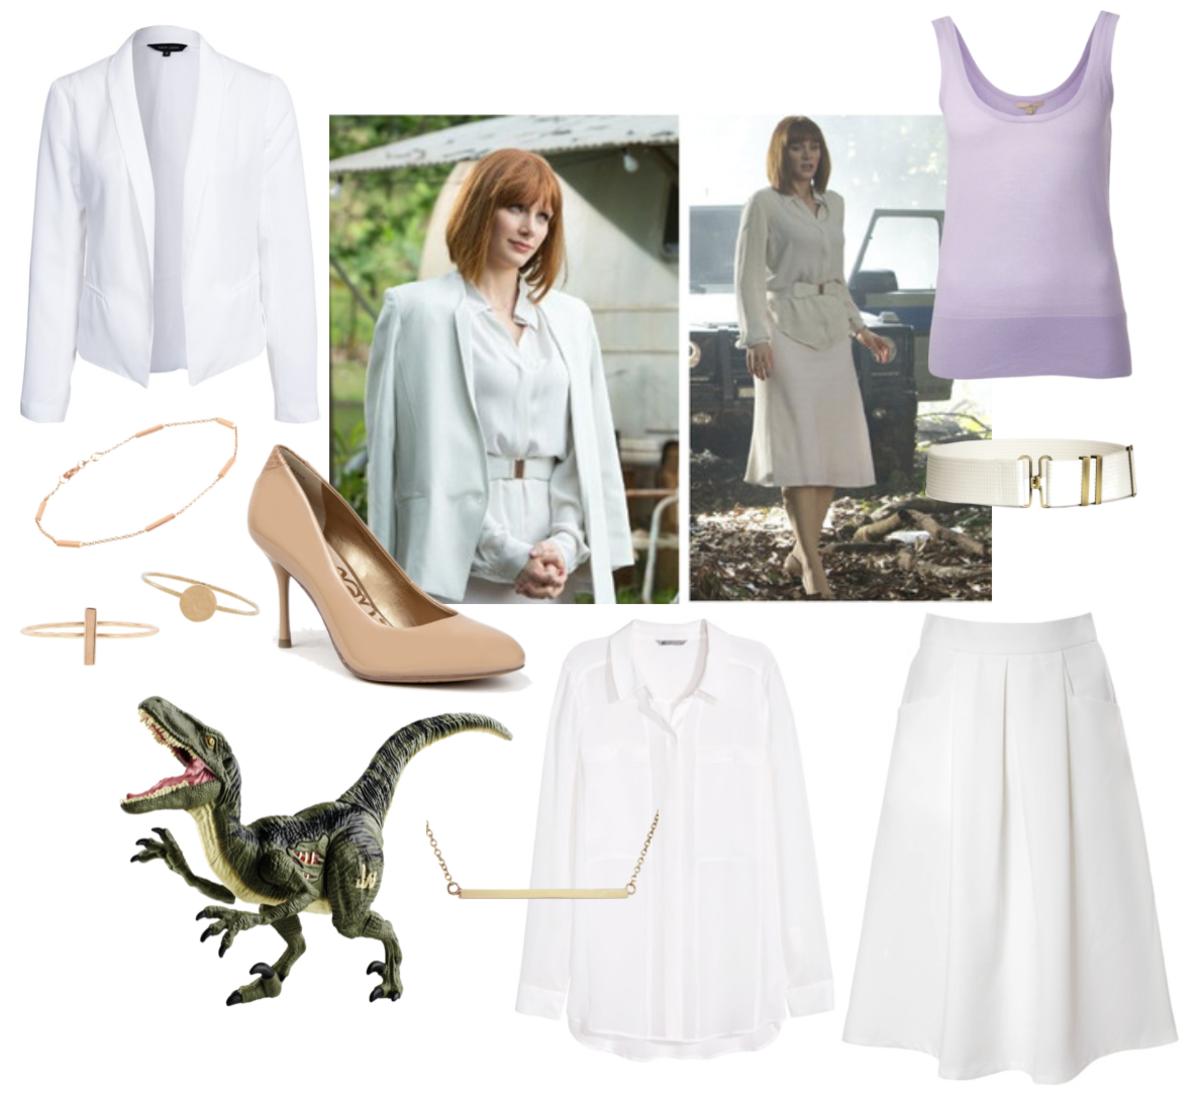 claire-dearing-jurassic-world-costume